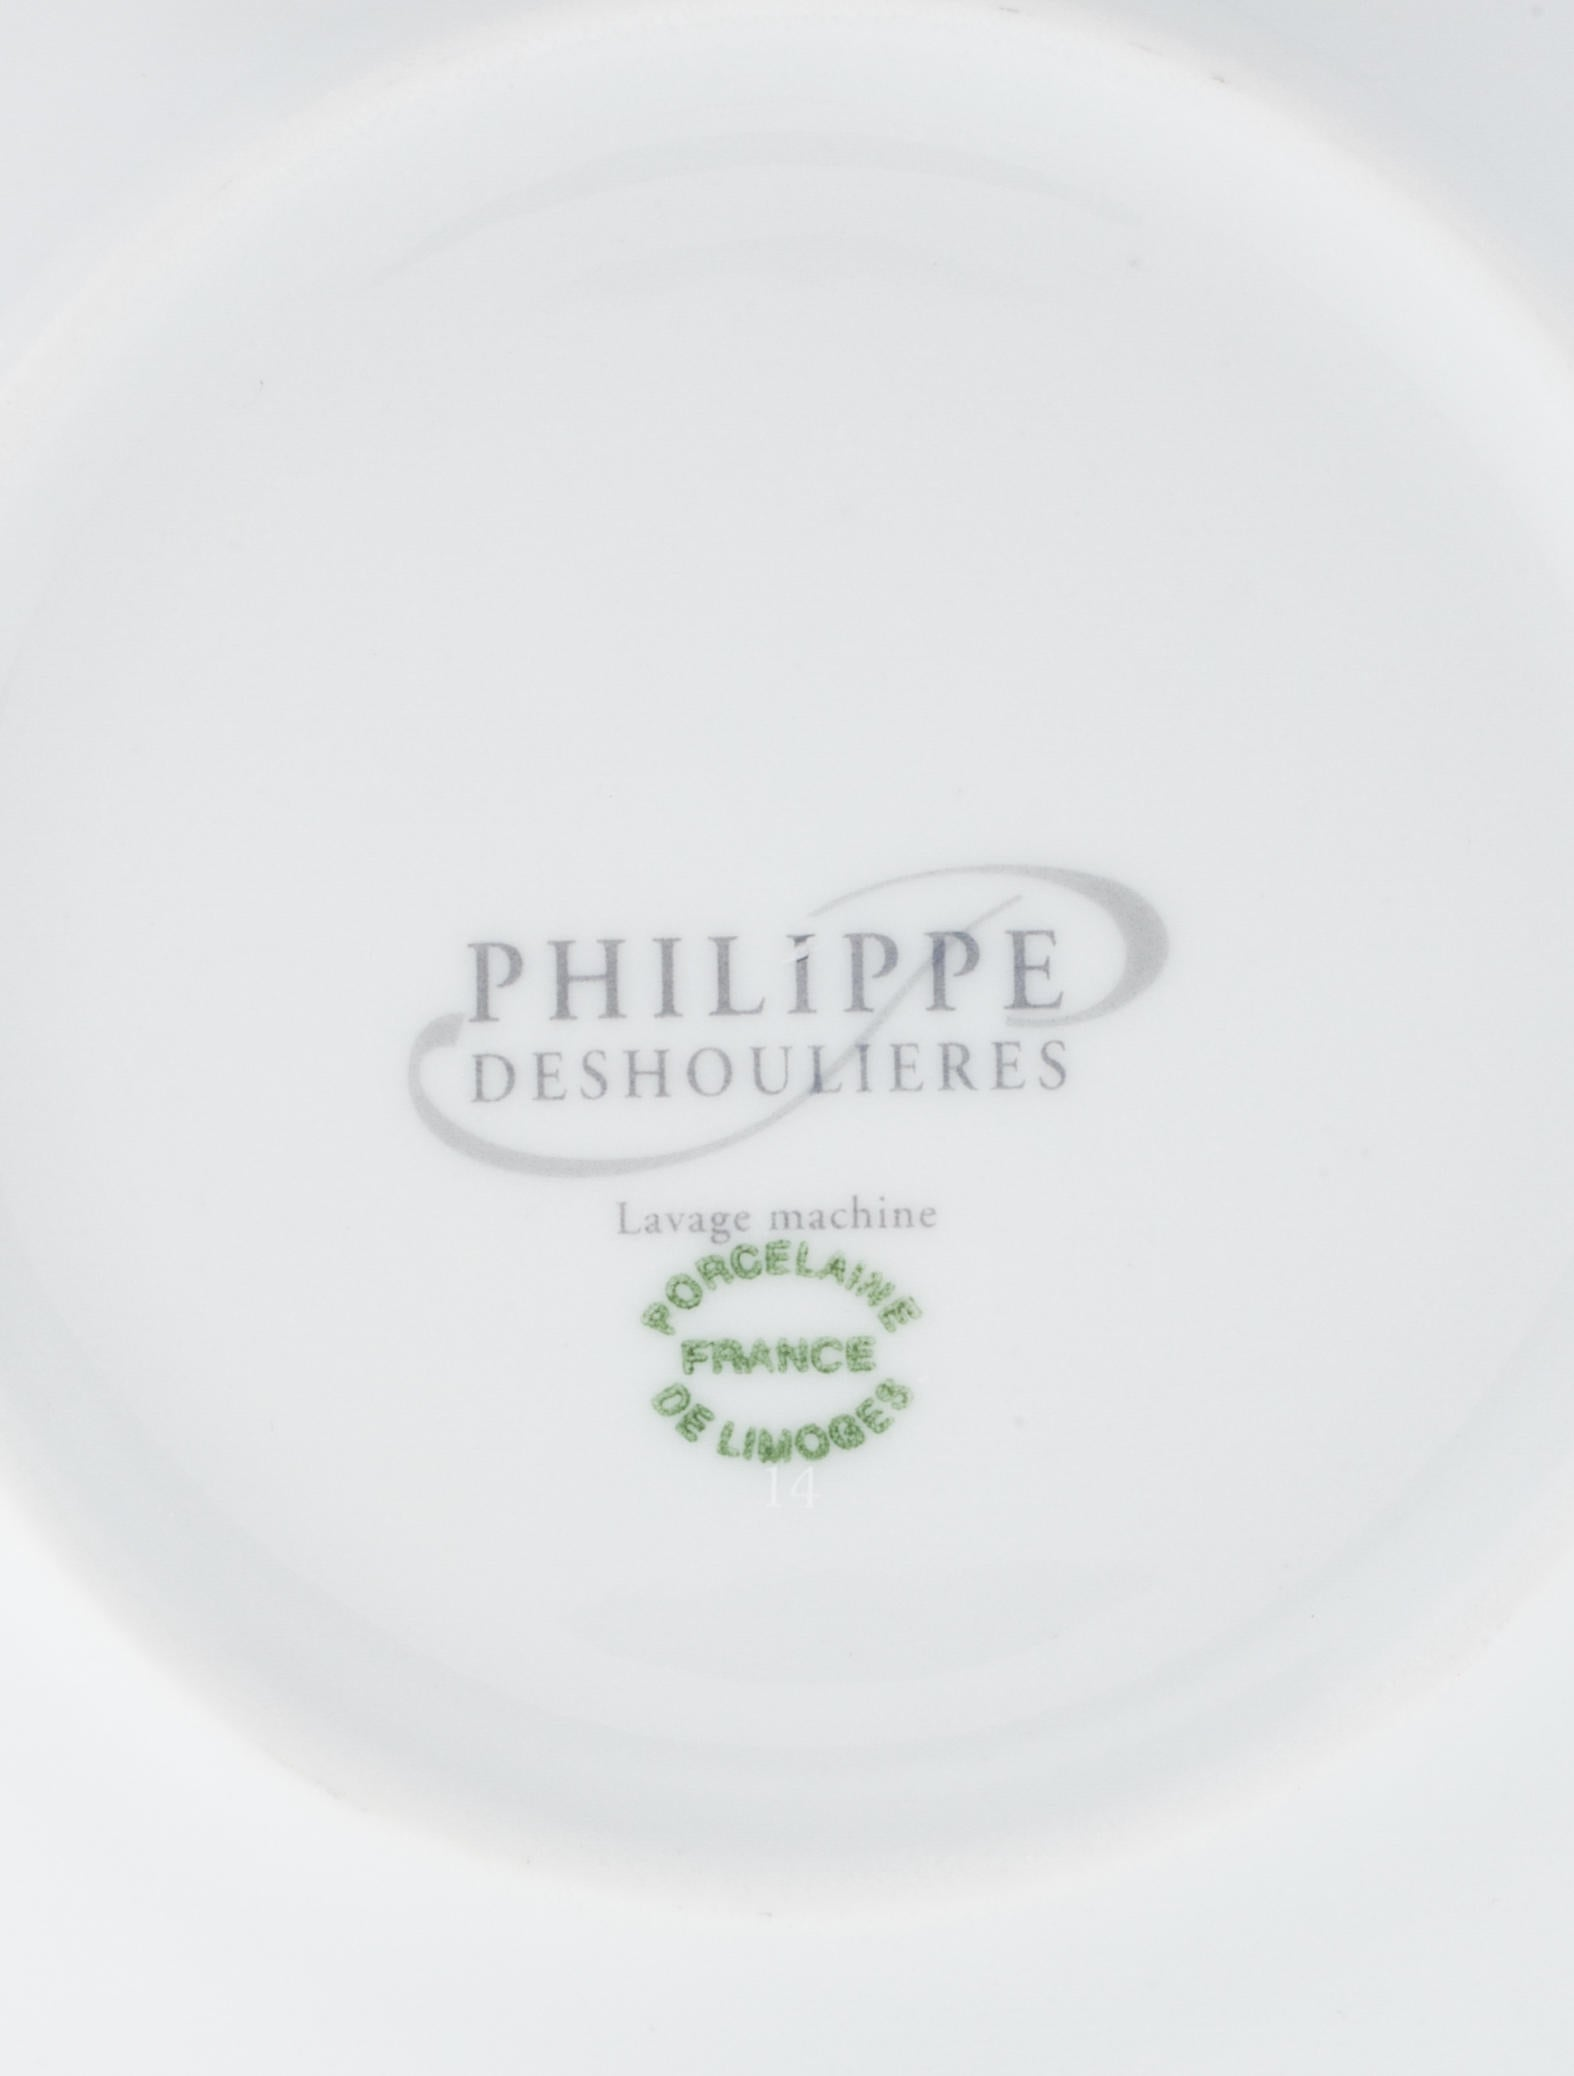 Philippe deshoulieres merchant row canape plates for Philippe deshoulieres canape plates